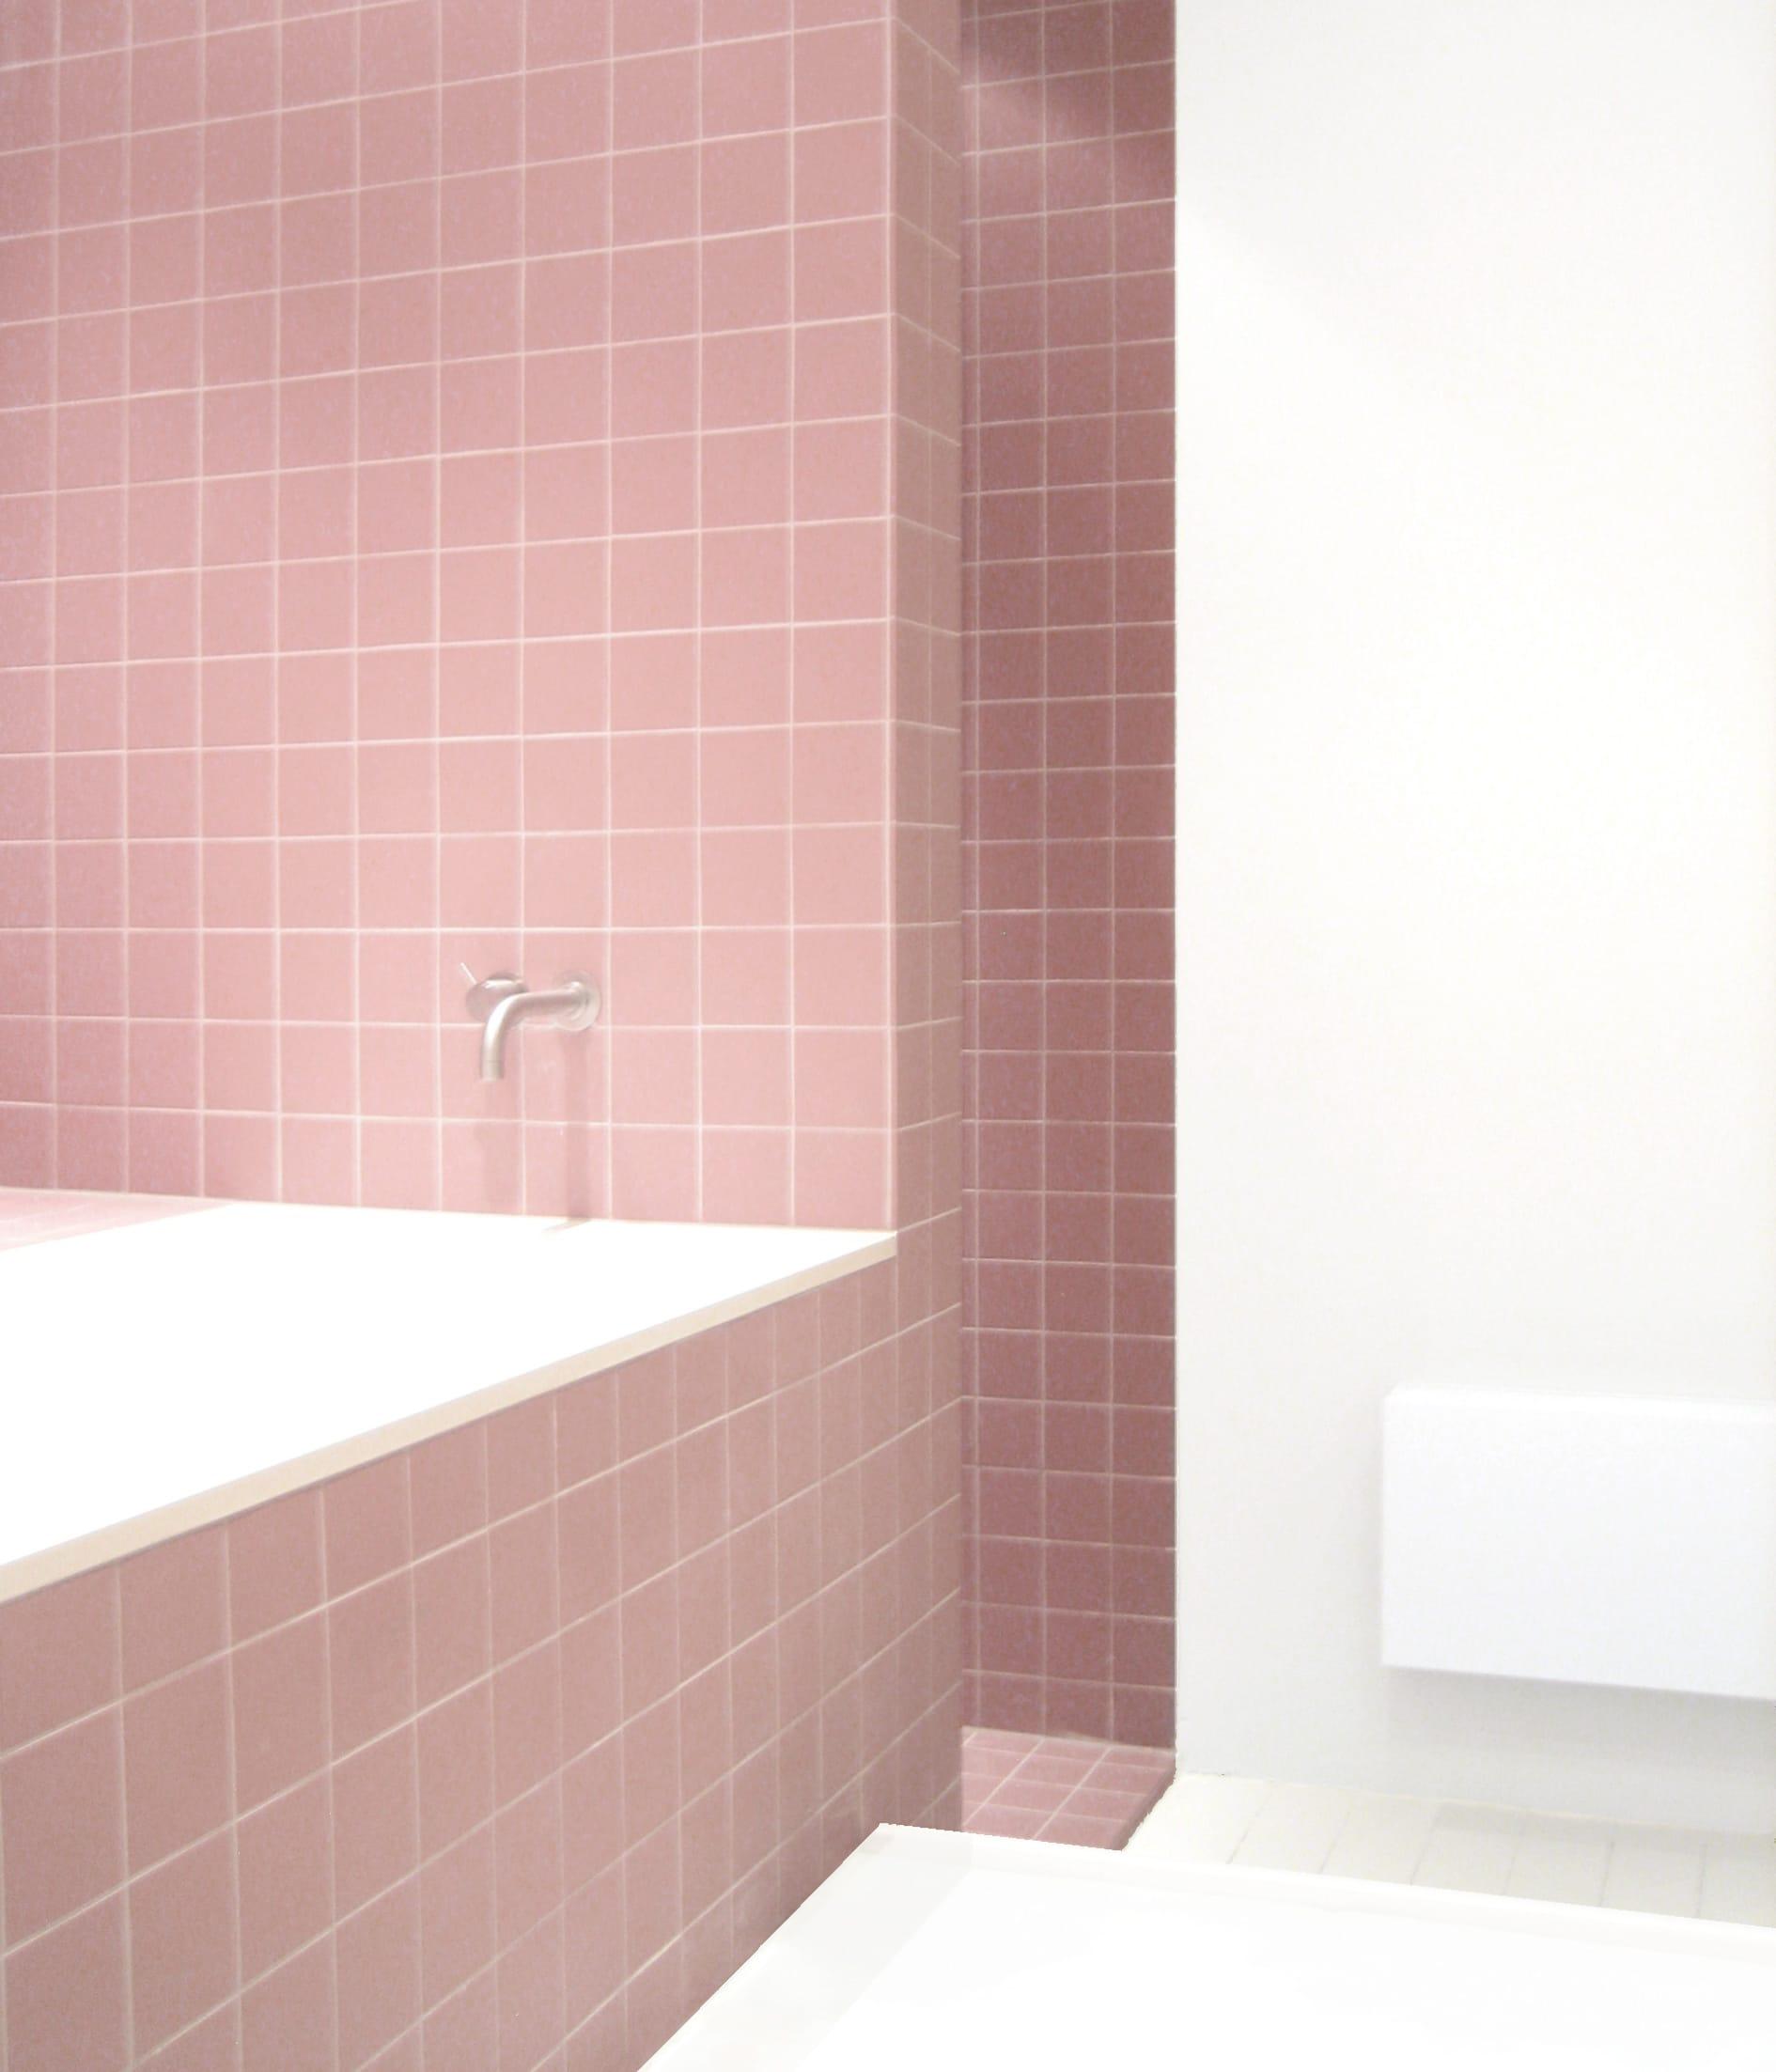 luxe bad badkamer roze tegels